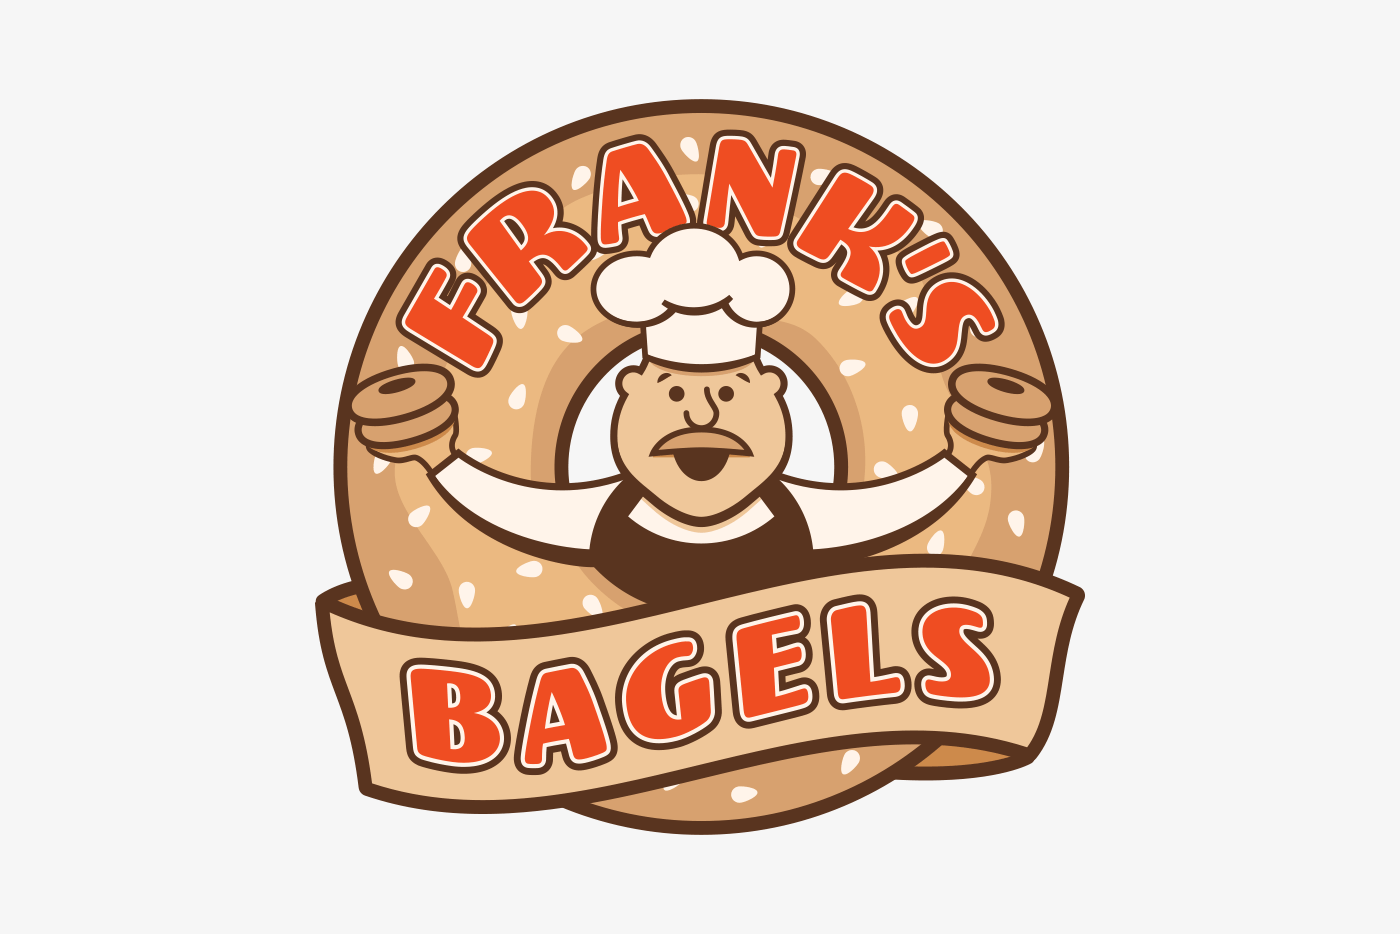 Bagel Shop Logo Grace and Frankie